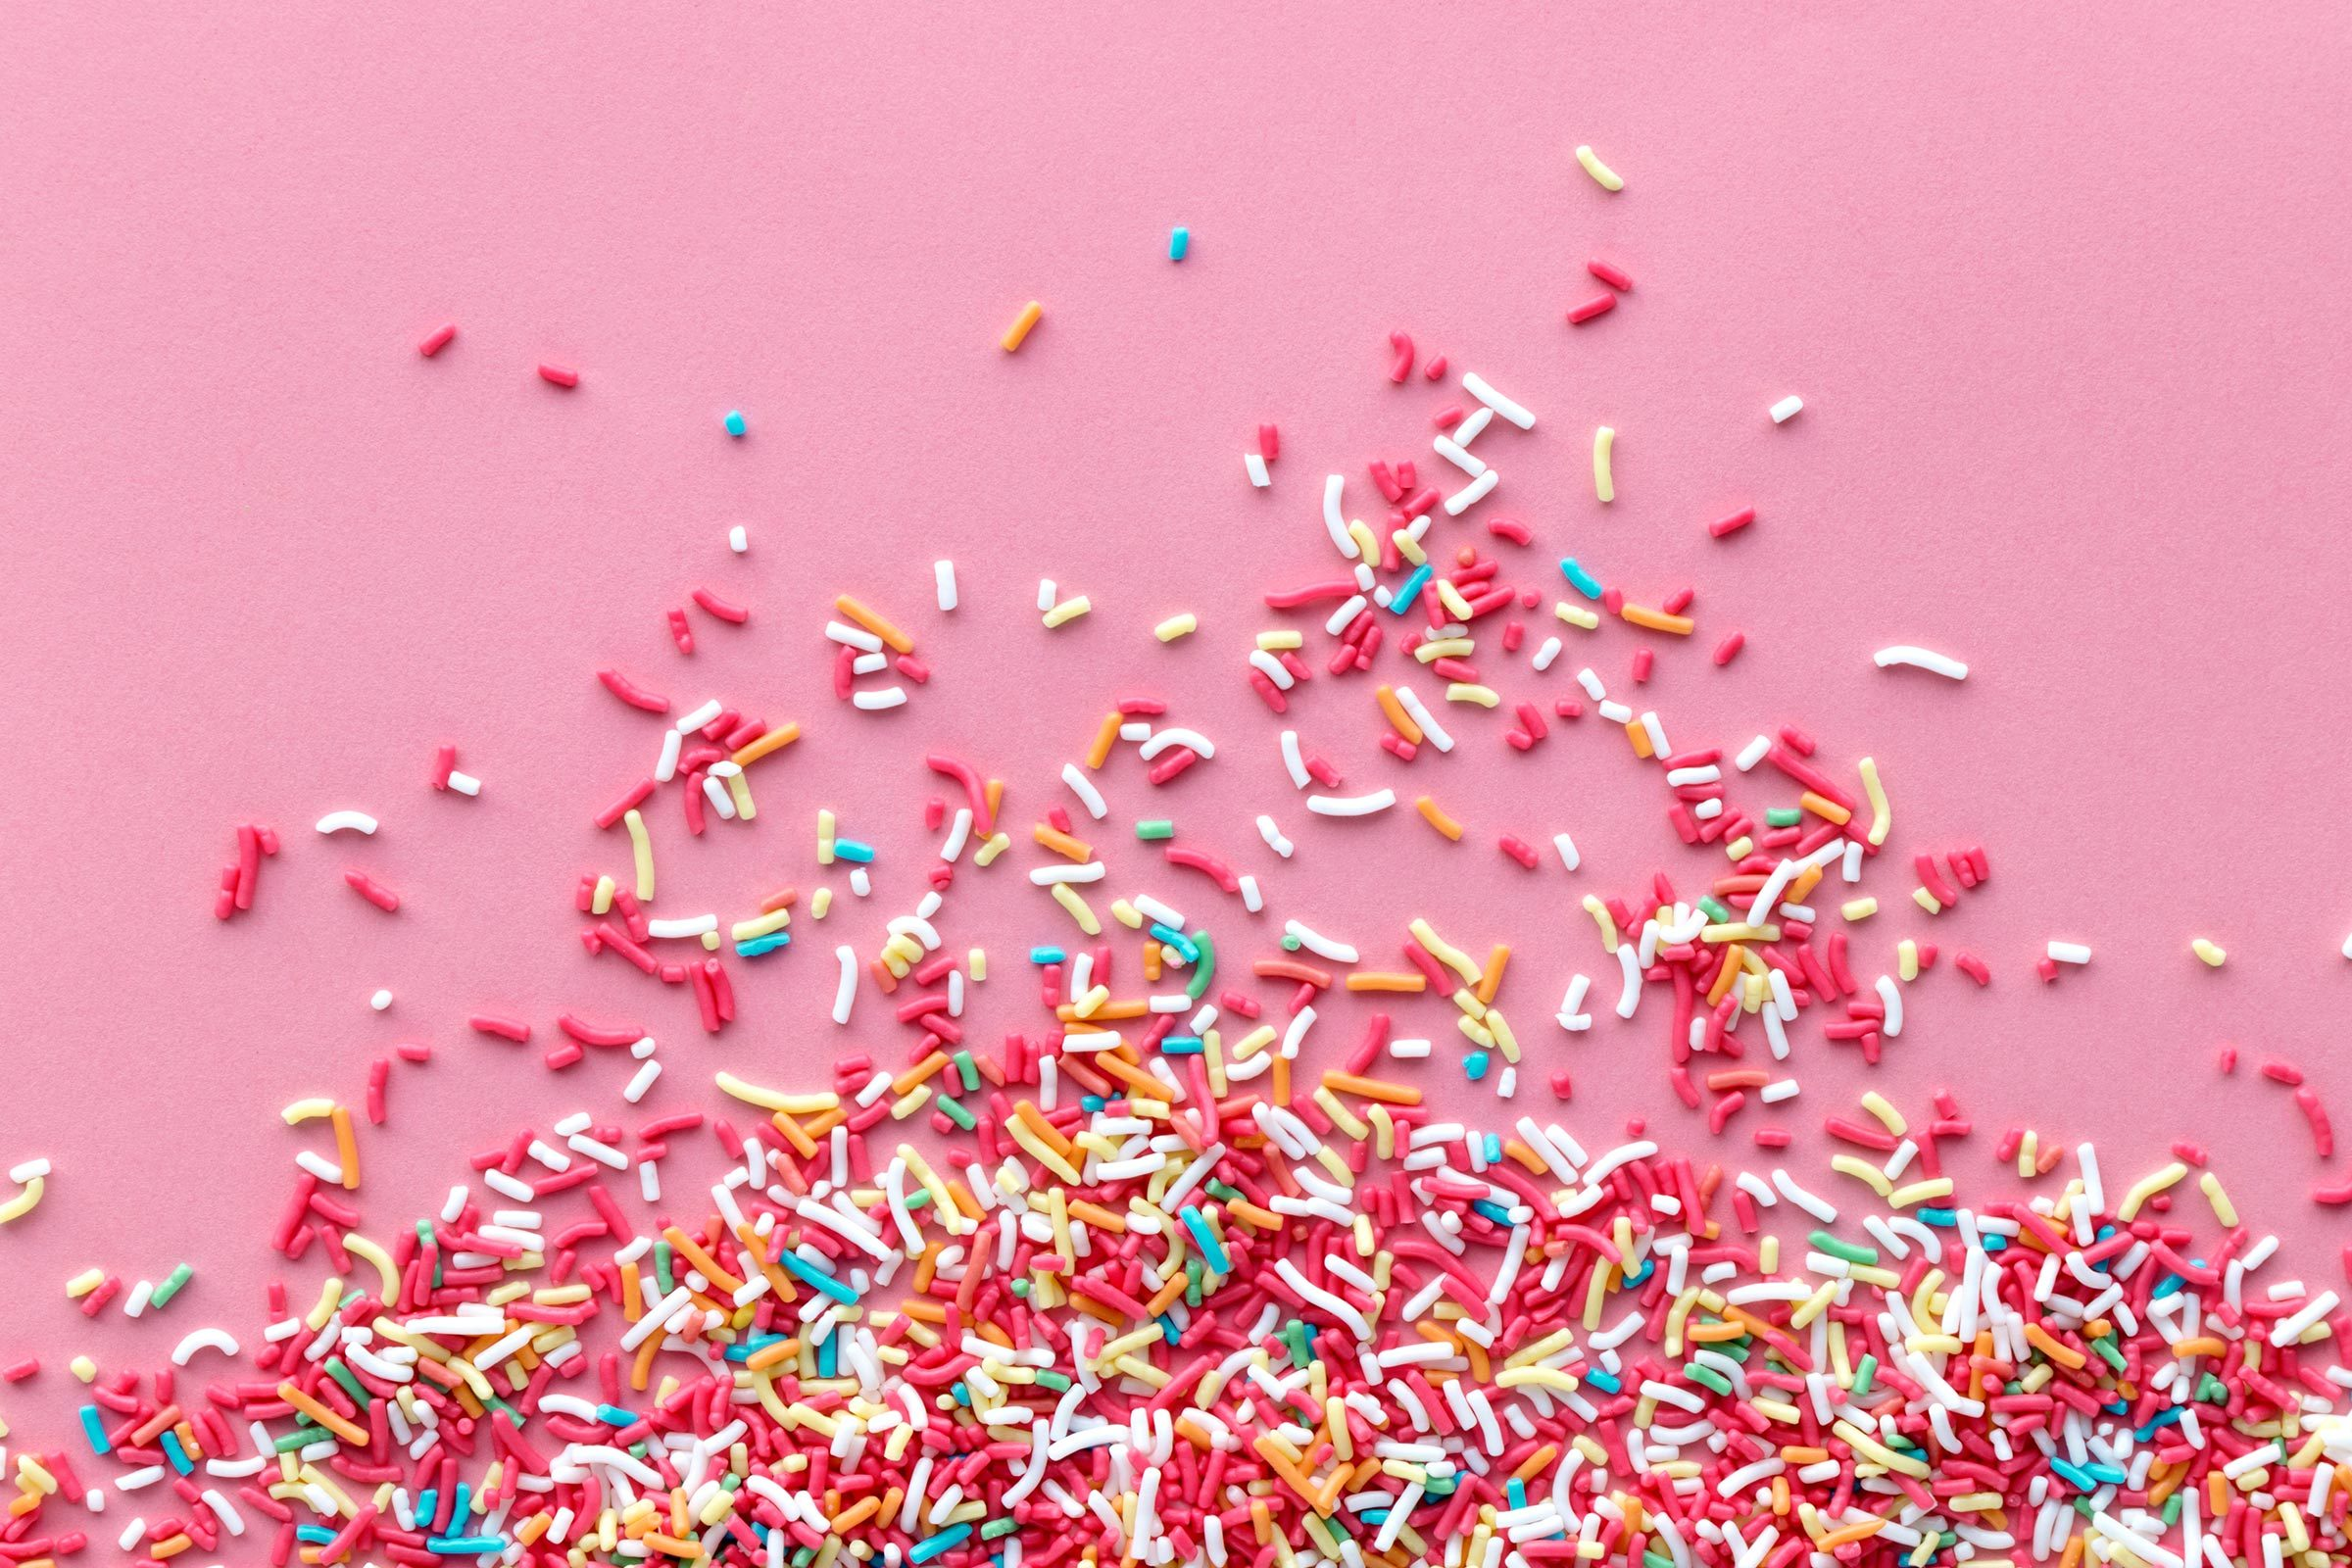 sprinkles pink background